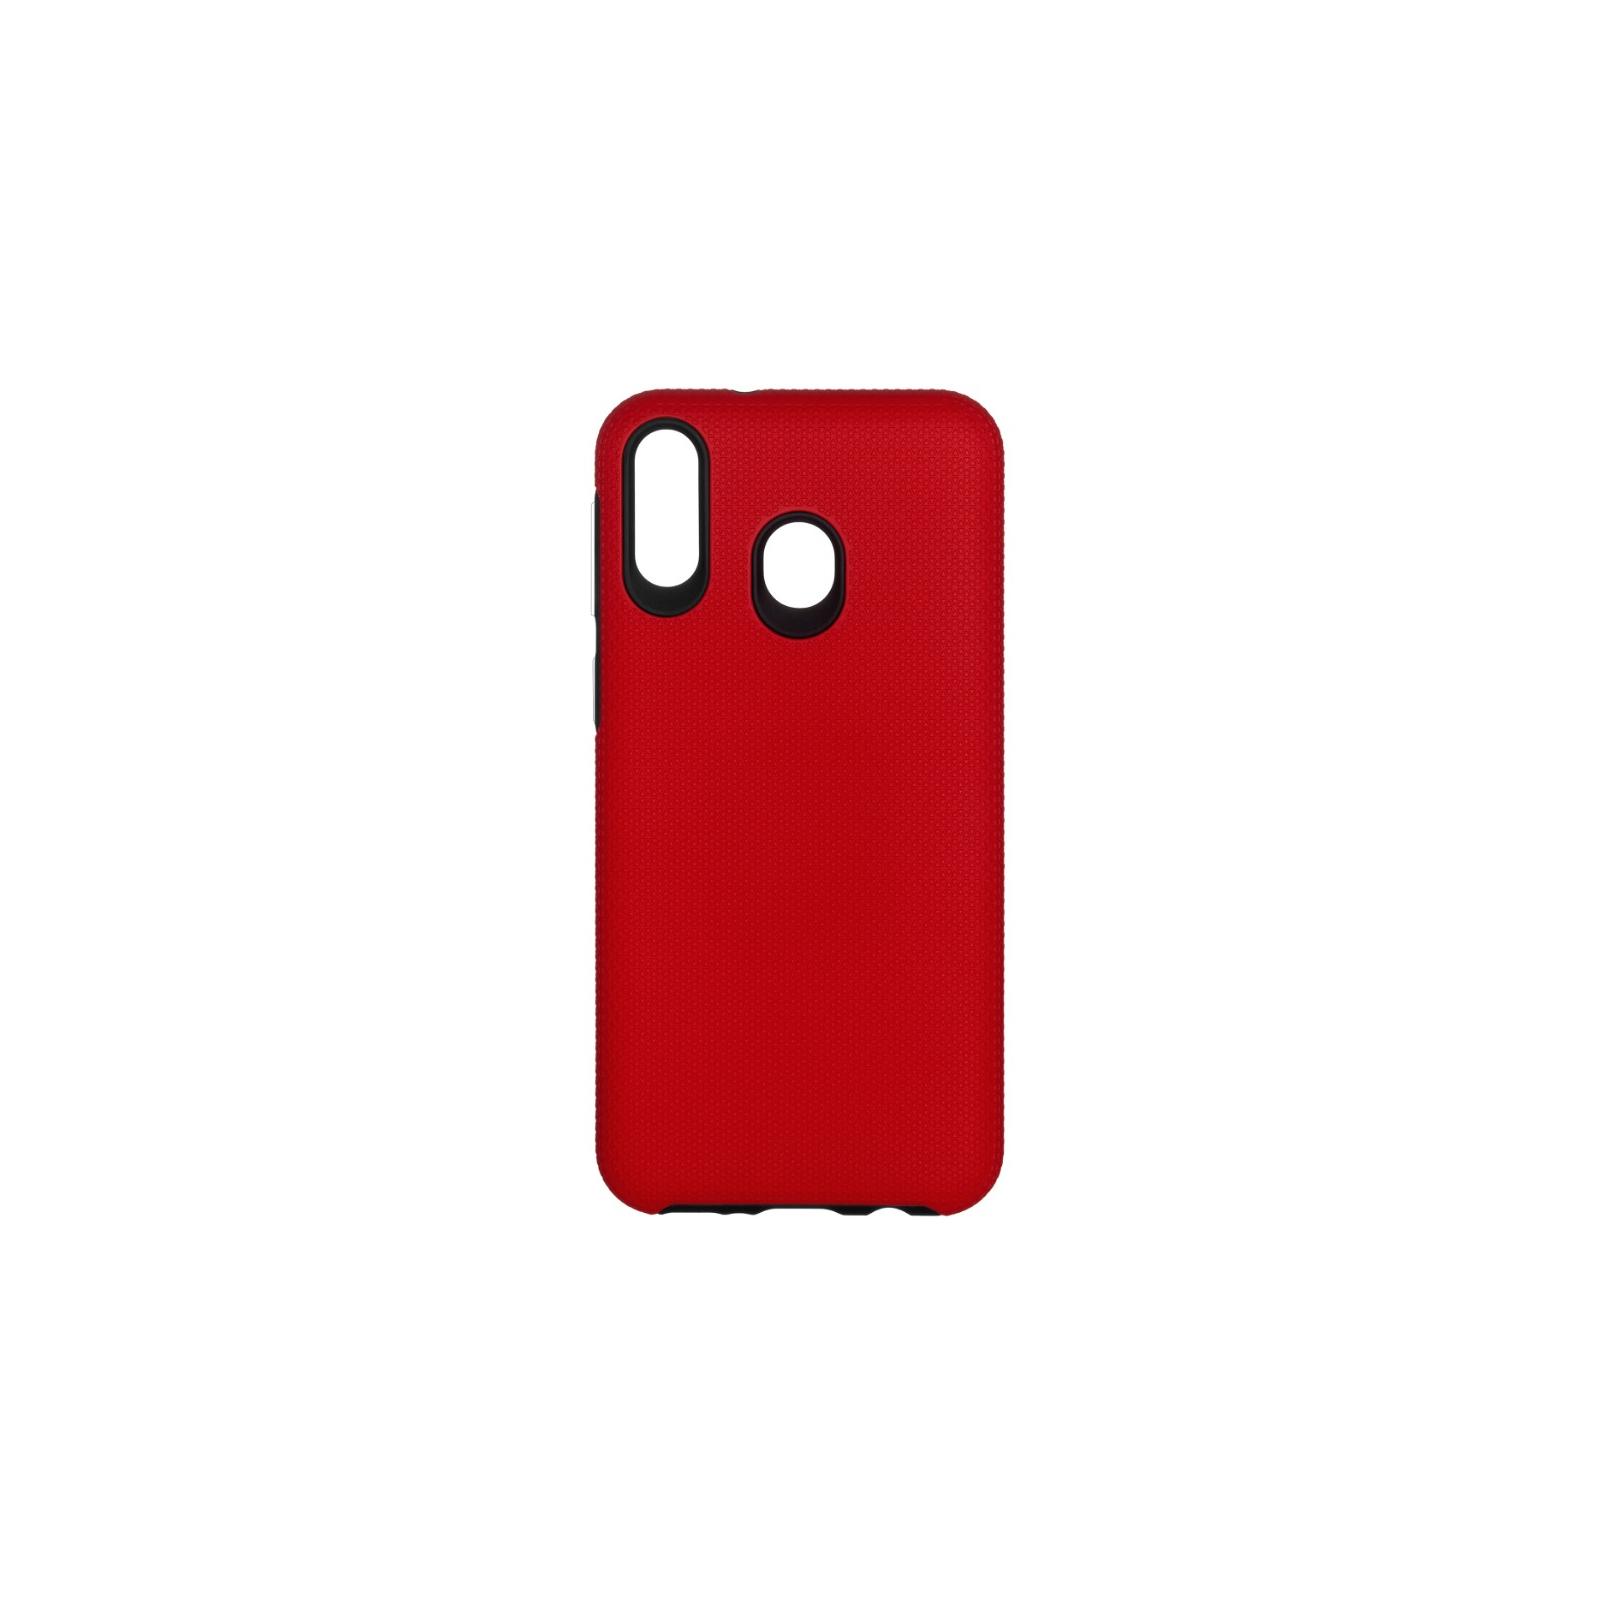 Чохол до моб. телефона 2E Samsung Galaxy M20 (M205), Triangle, Red (2E-G-M20-TKTLRD)